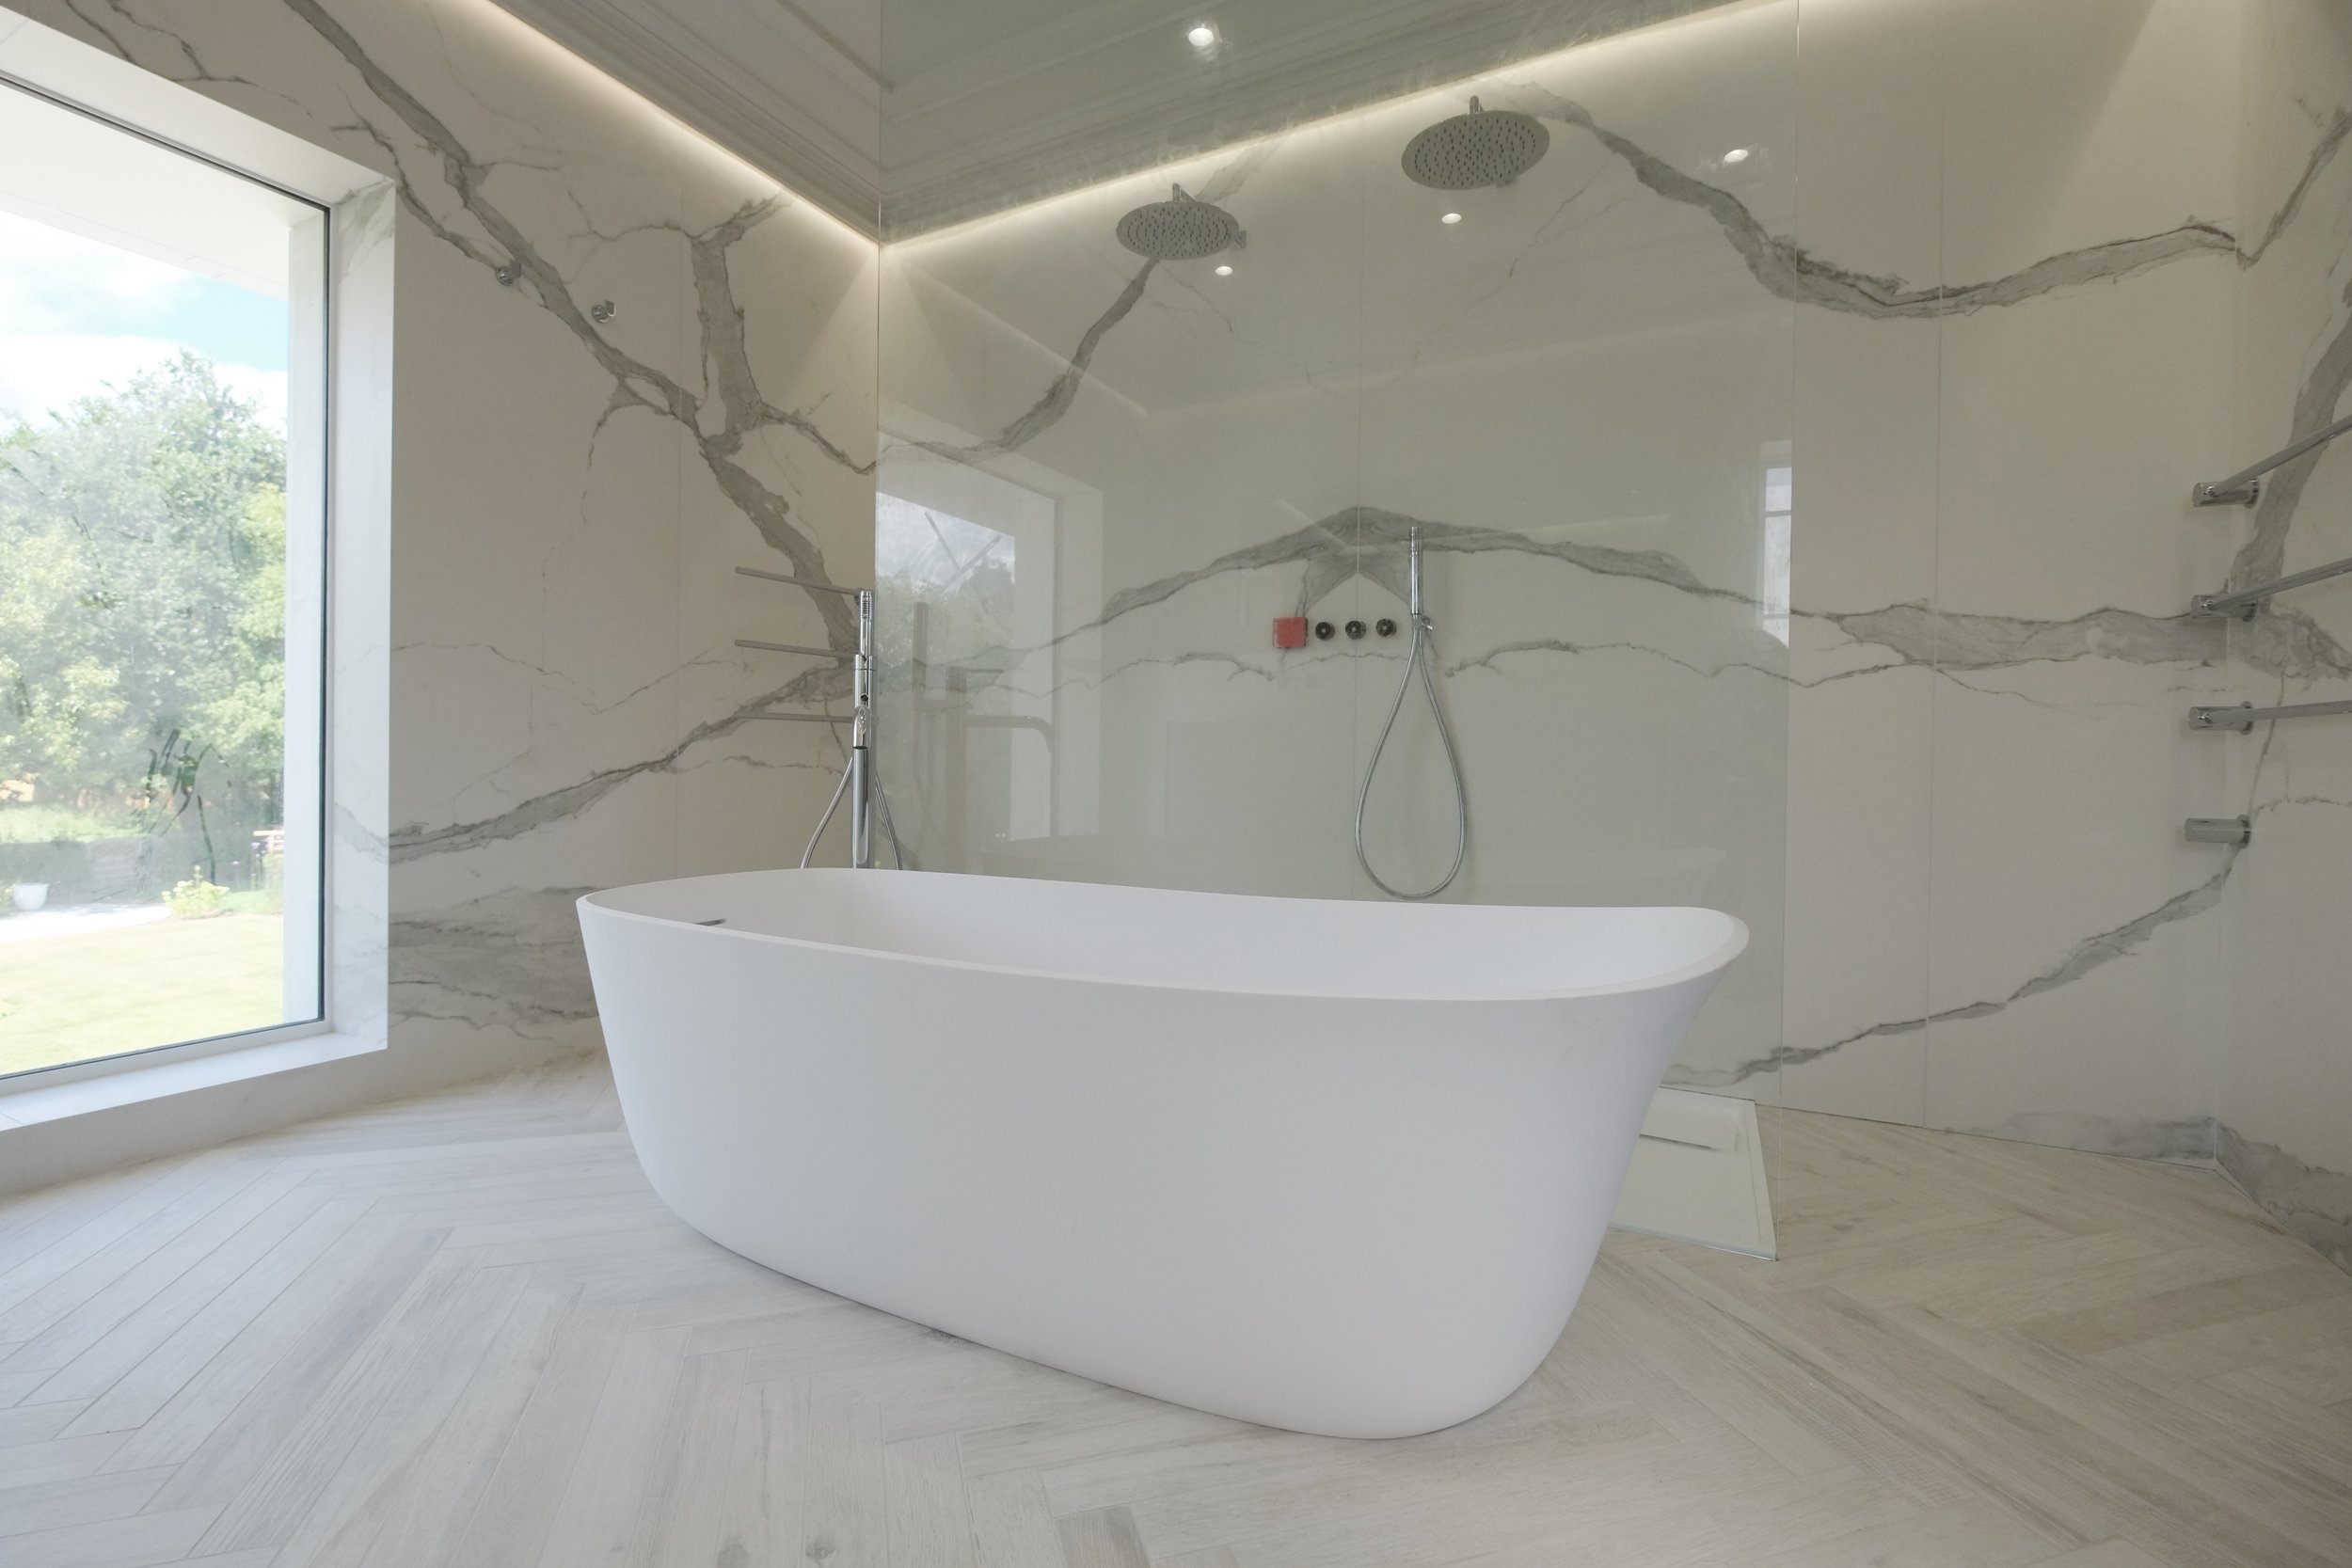 Tiles featured: walls: I Classici di Rex Statuario soft; floor: Wood of Cerim waterjet to create herringbone